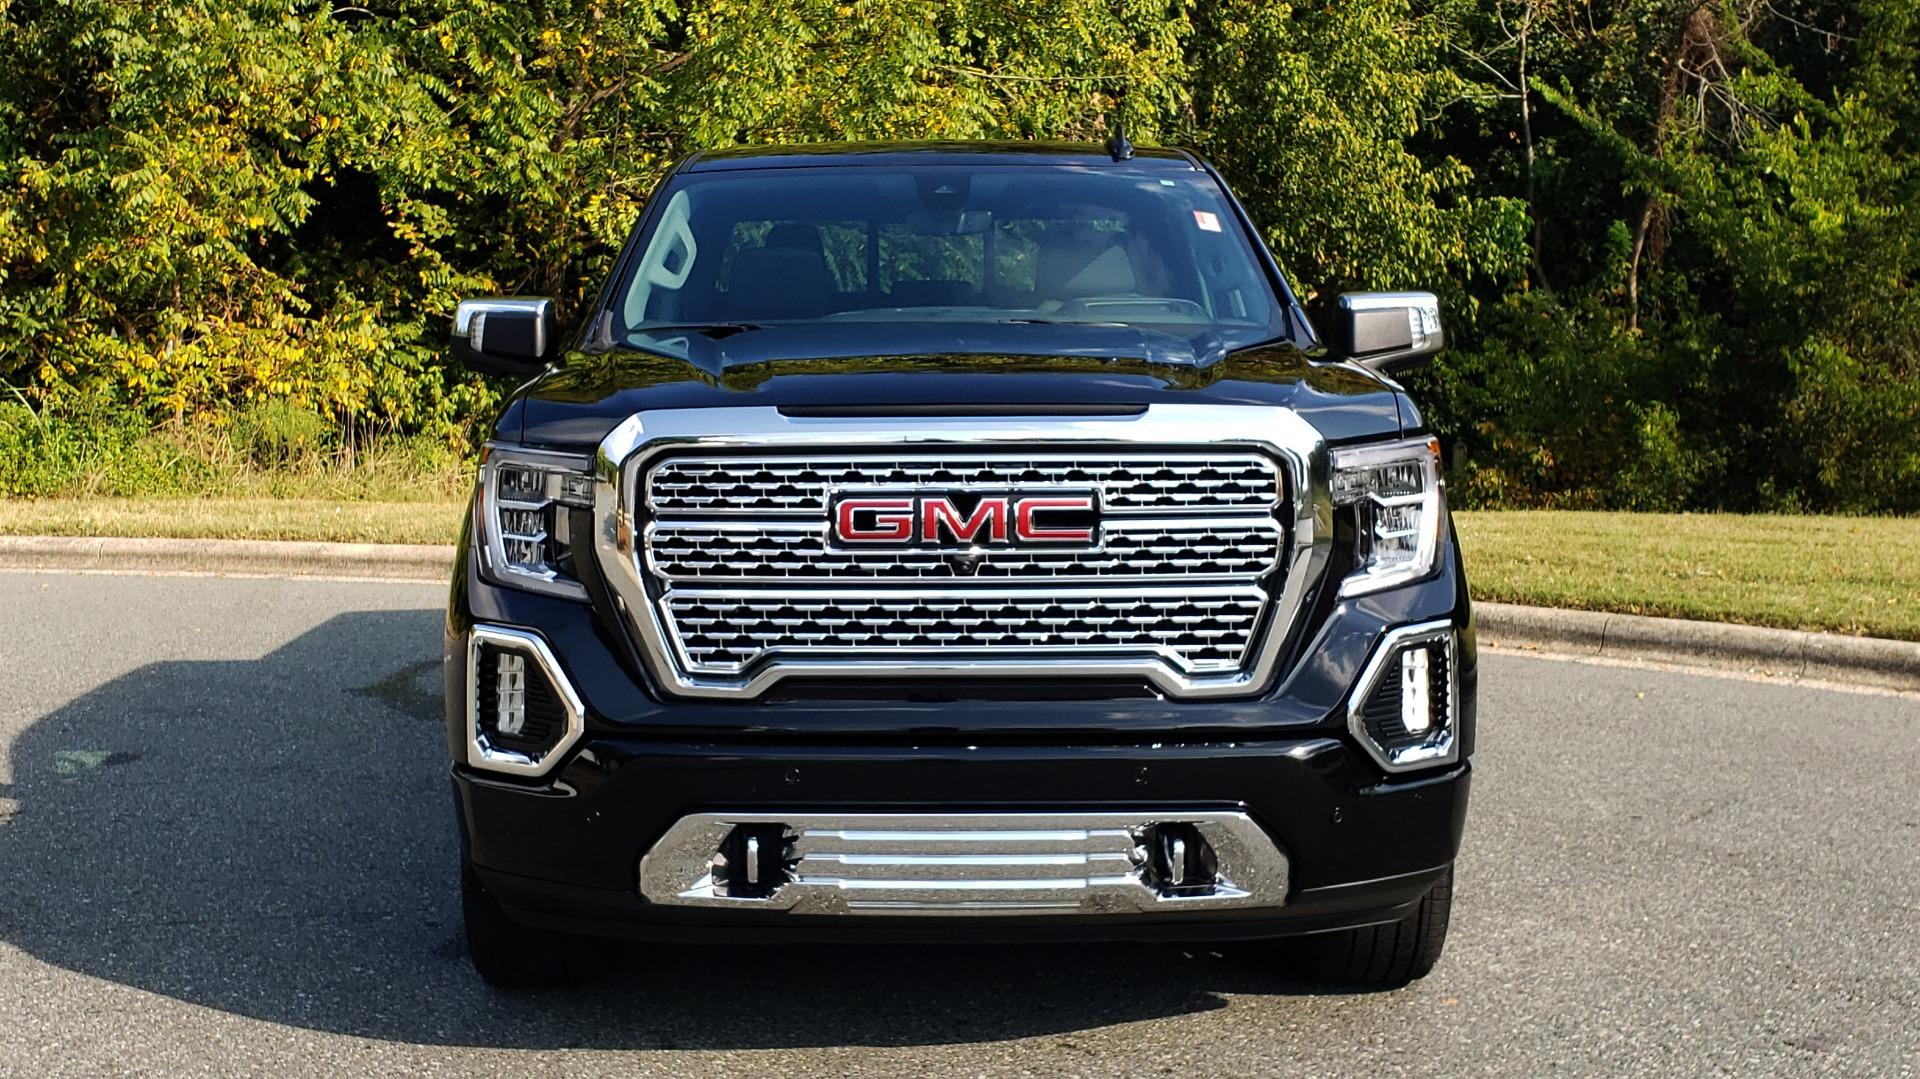 Used 2019 GMC SIERRA 1500 DENALI ULTIMATE 4WD / NAV / TECH PKG / DRVR ALRT for sale Sold at Formula Imports in Charlotte NC 28227 28